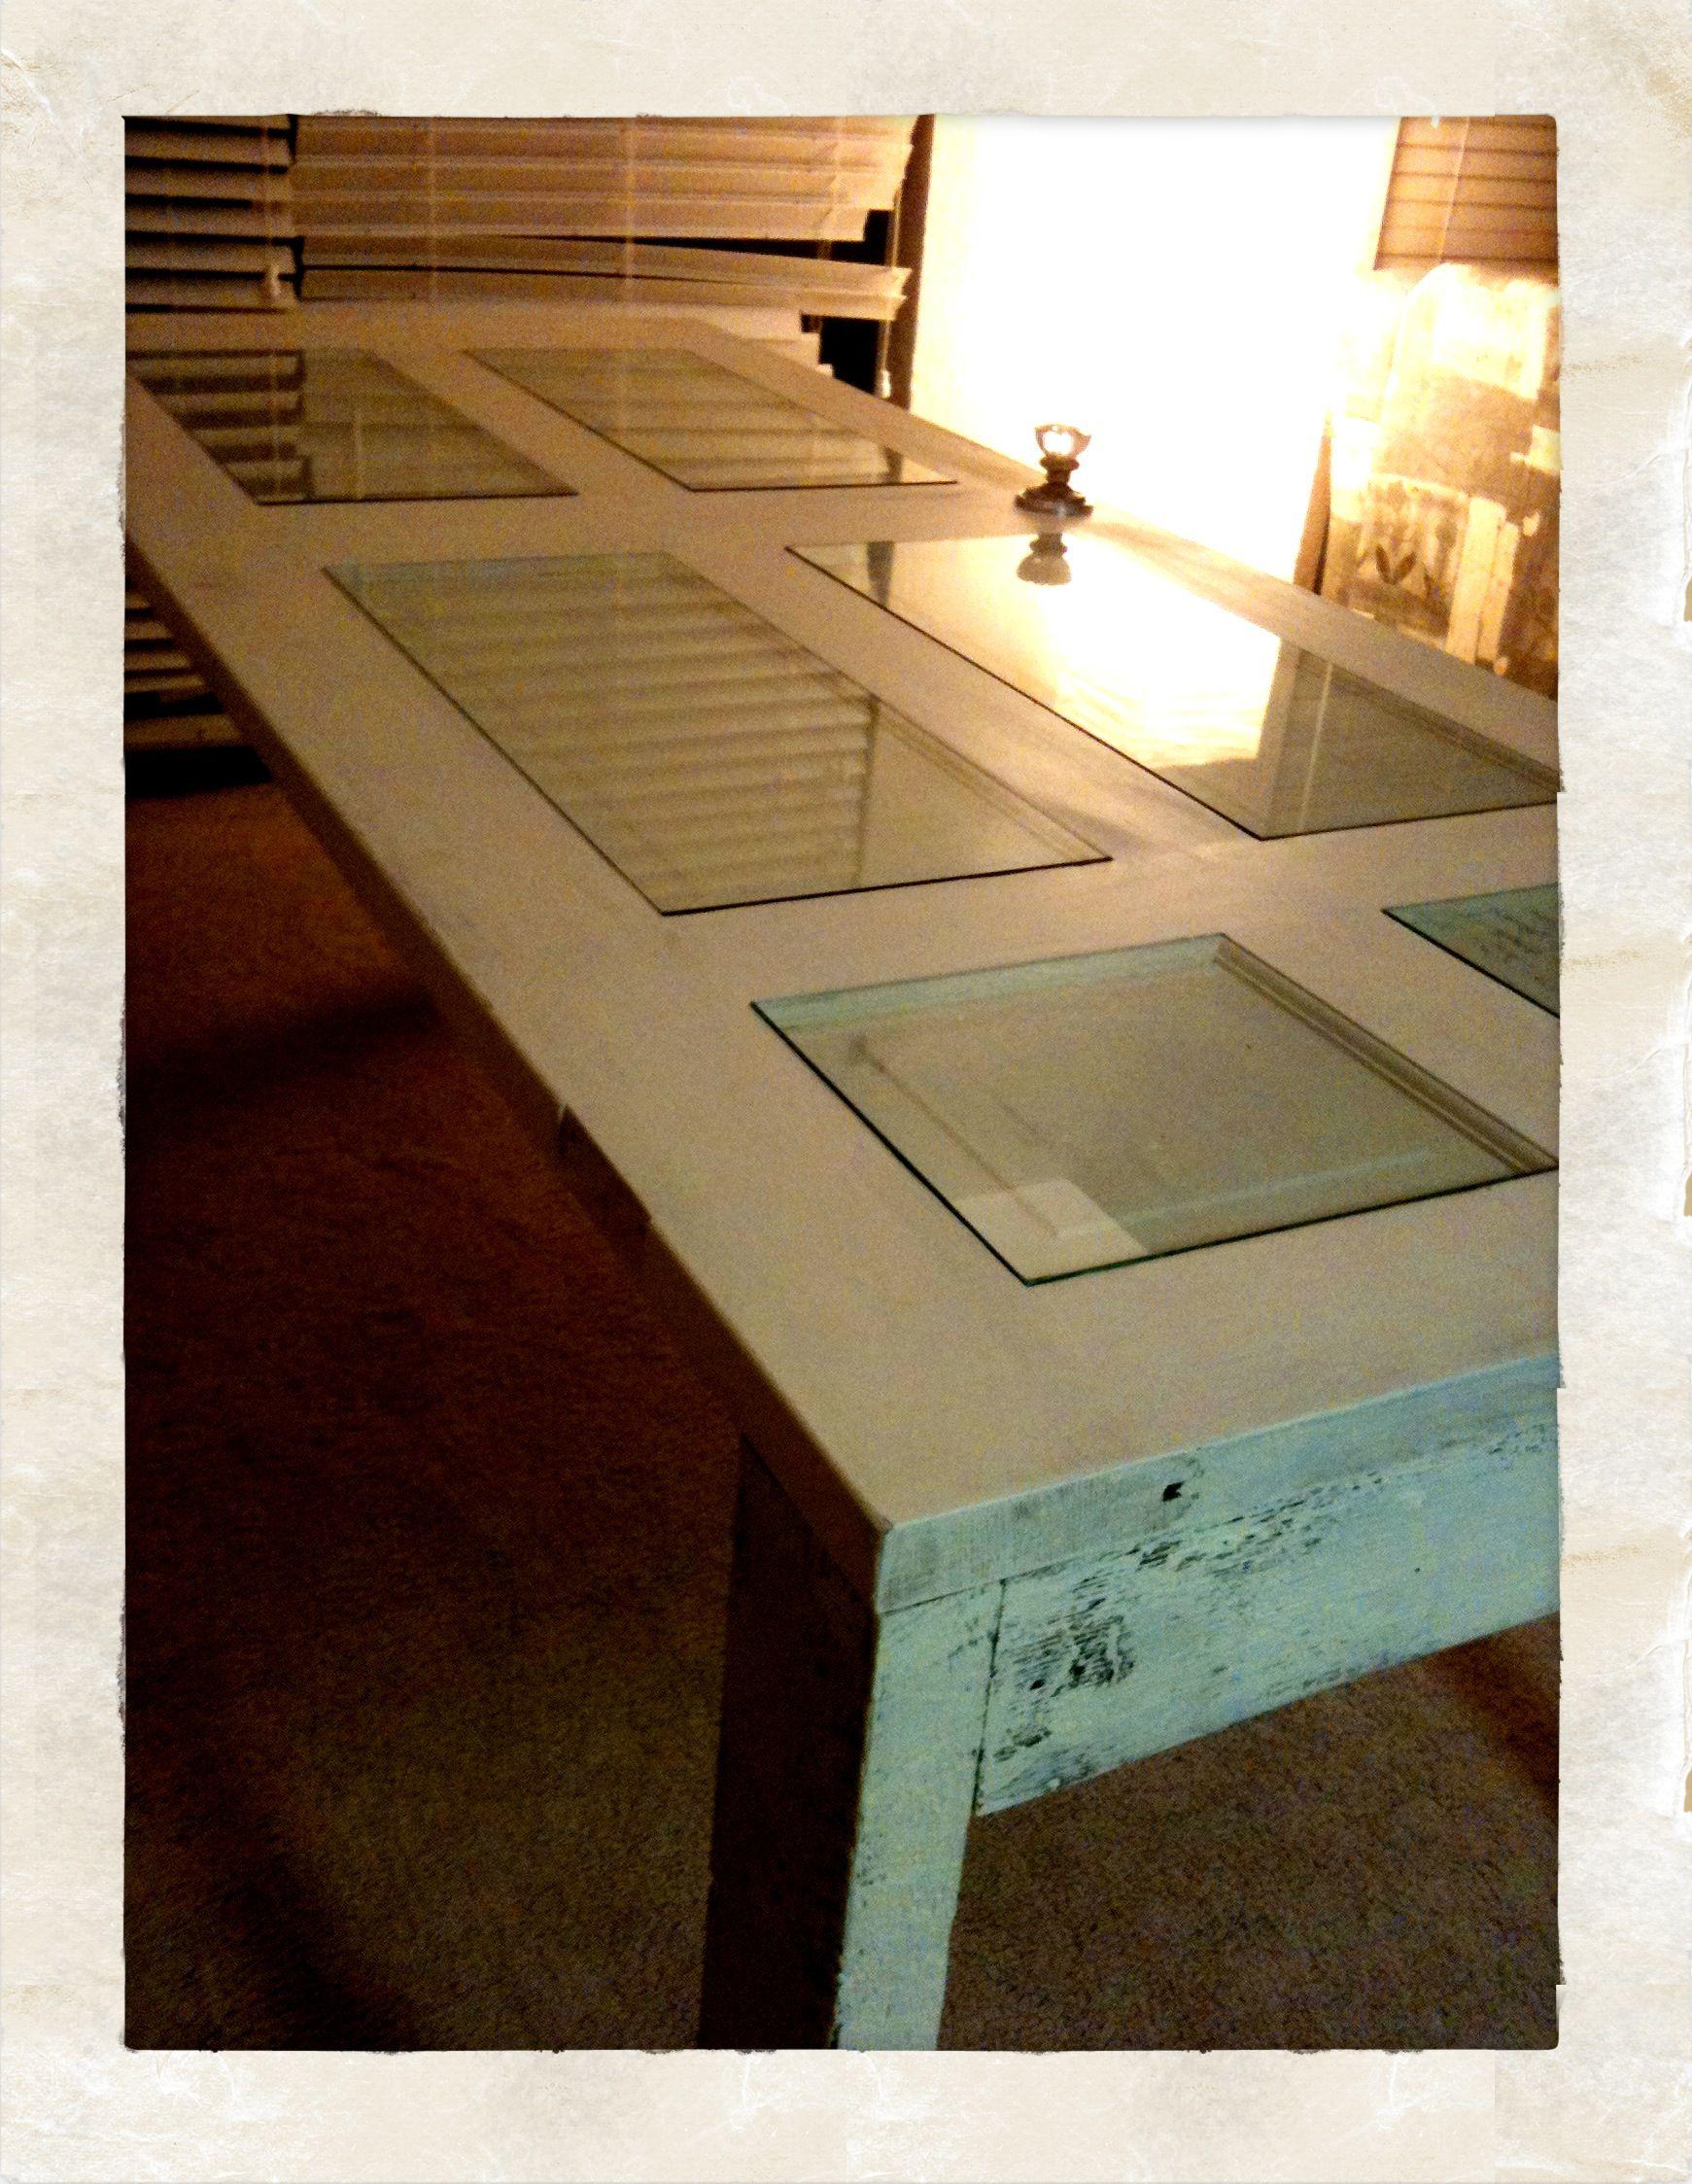 Buy Online Glass Table Top Shower Door Custom Glass And Mirrors Diy Furniture Projects Door Table Diy Outdoor Table